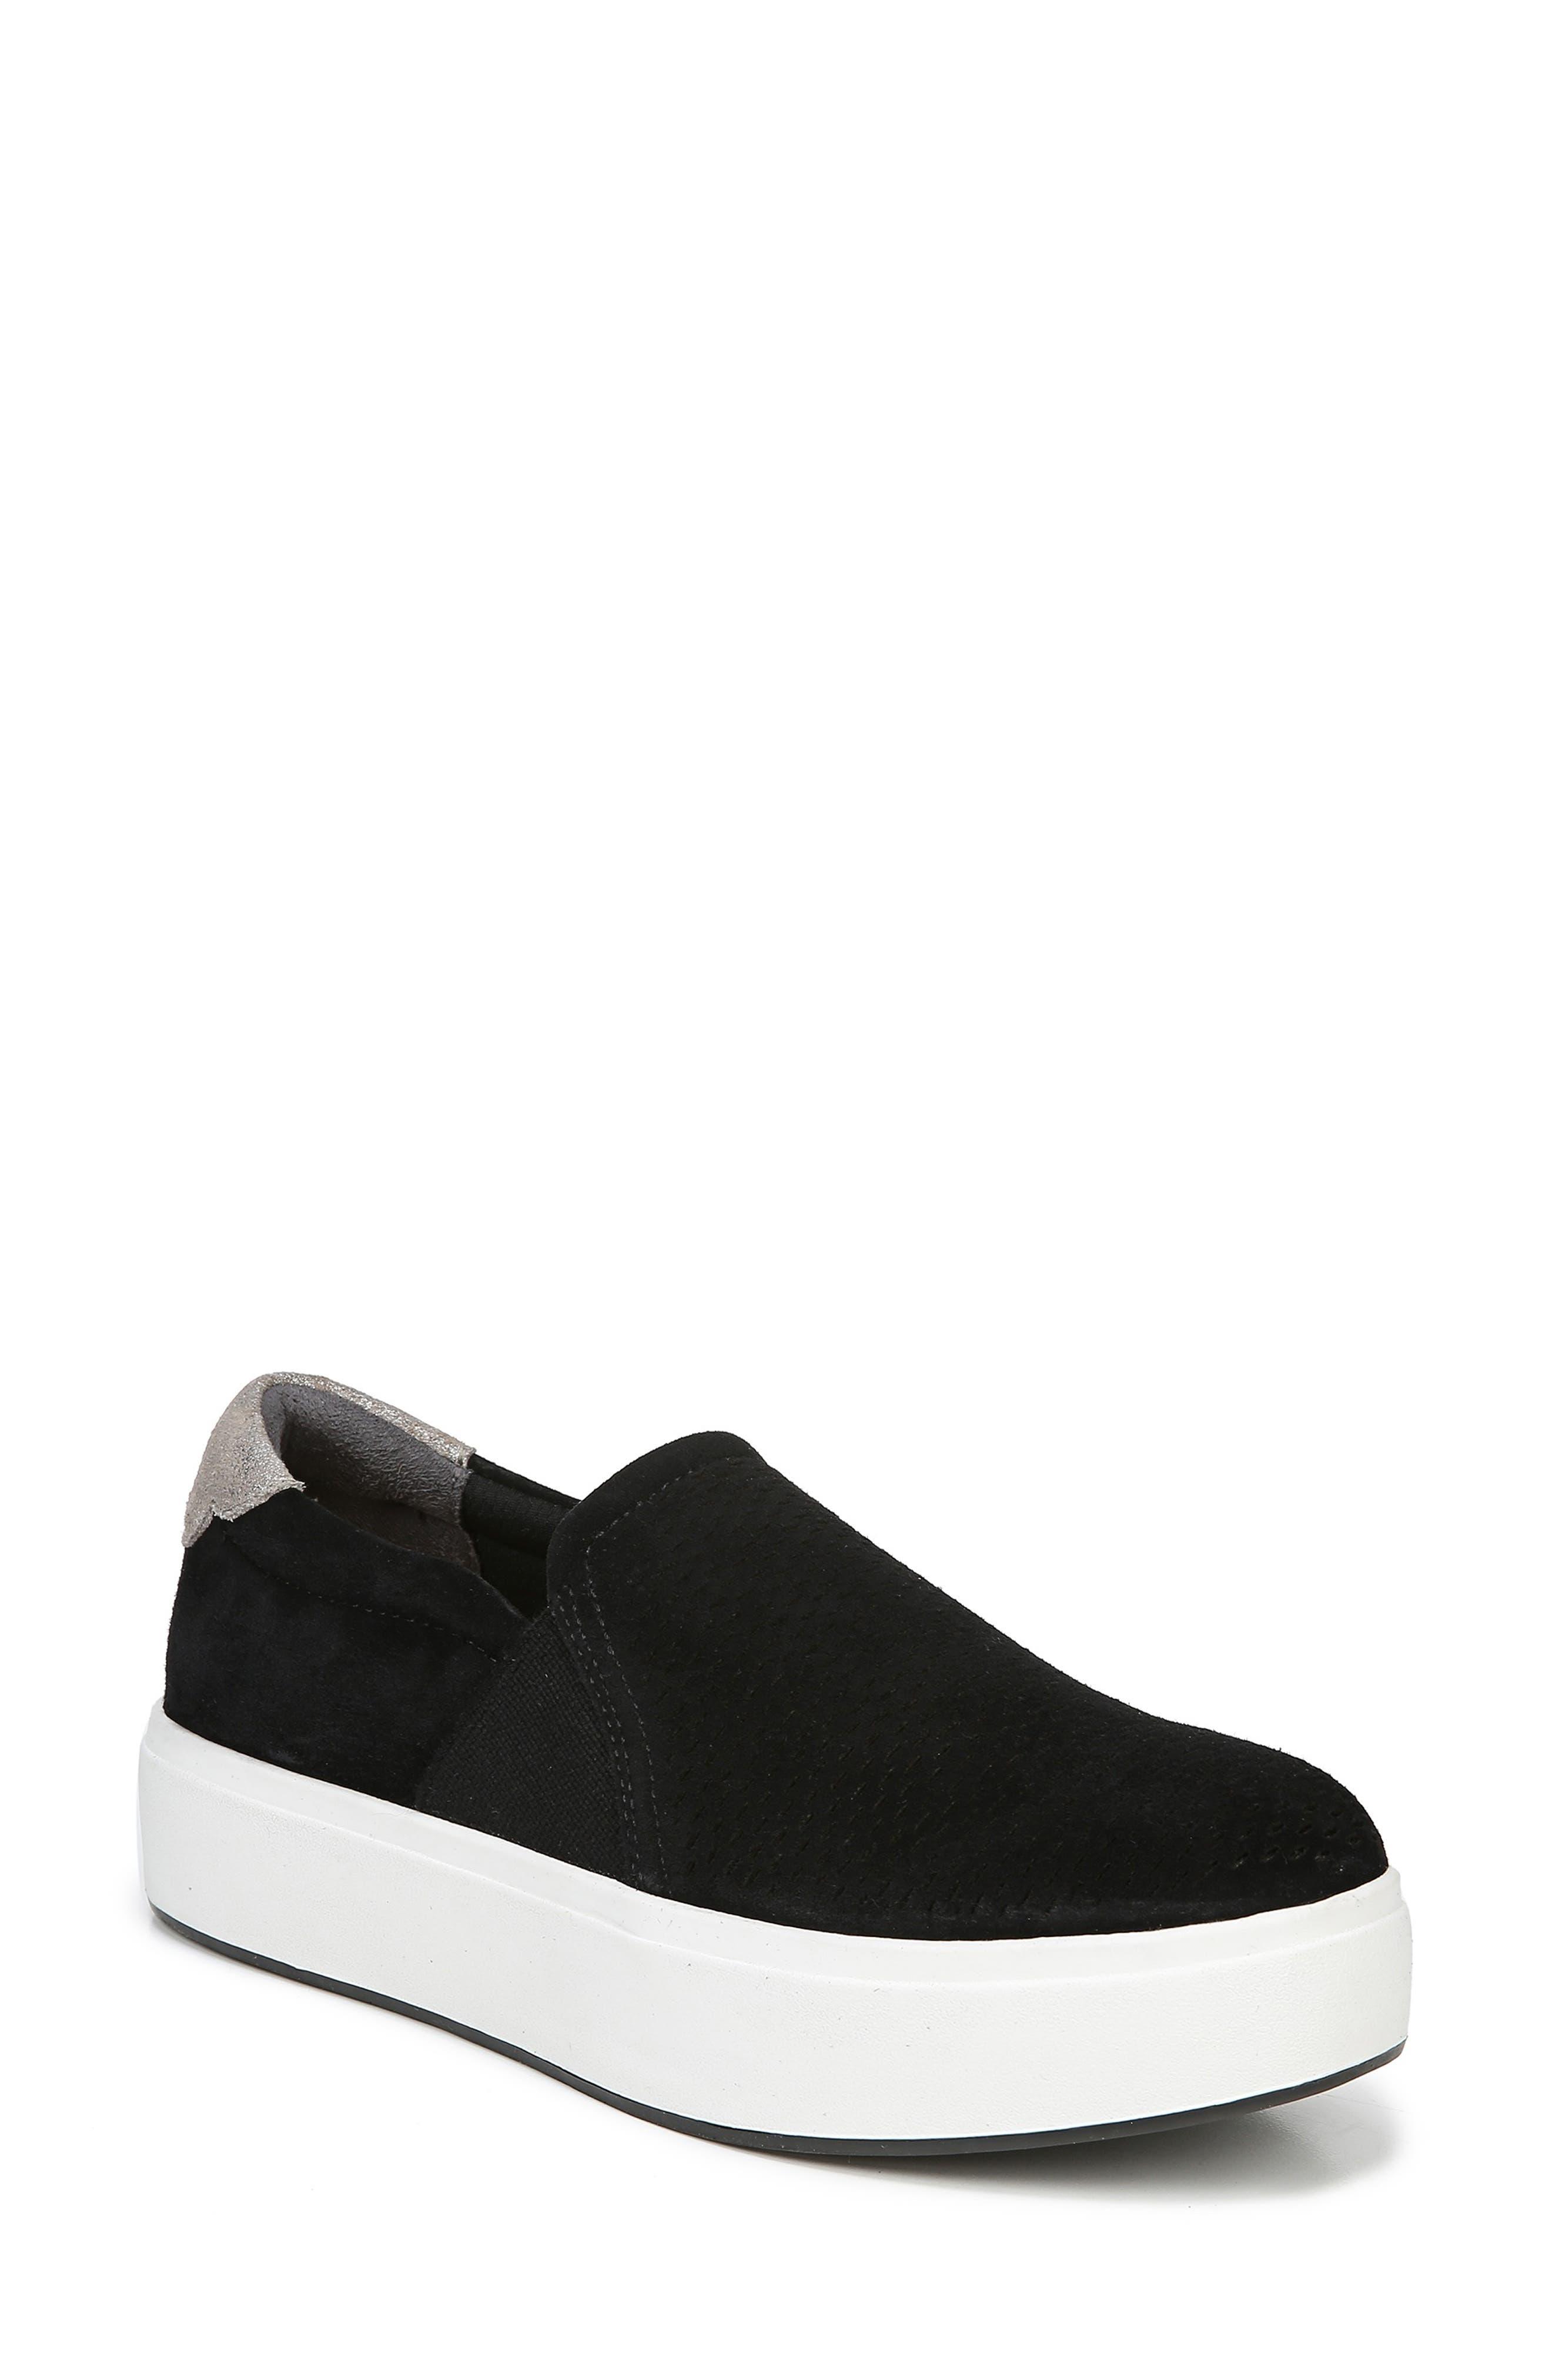 Abbot Lux Sneaker,                             Main thumbnail 1, color,                             BLACK SUEDE